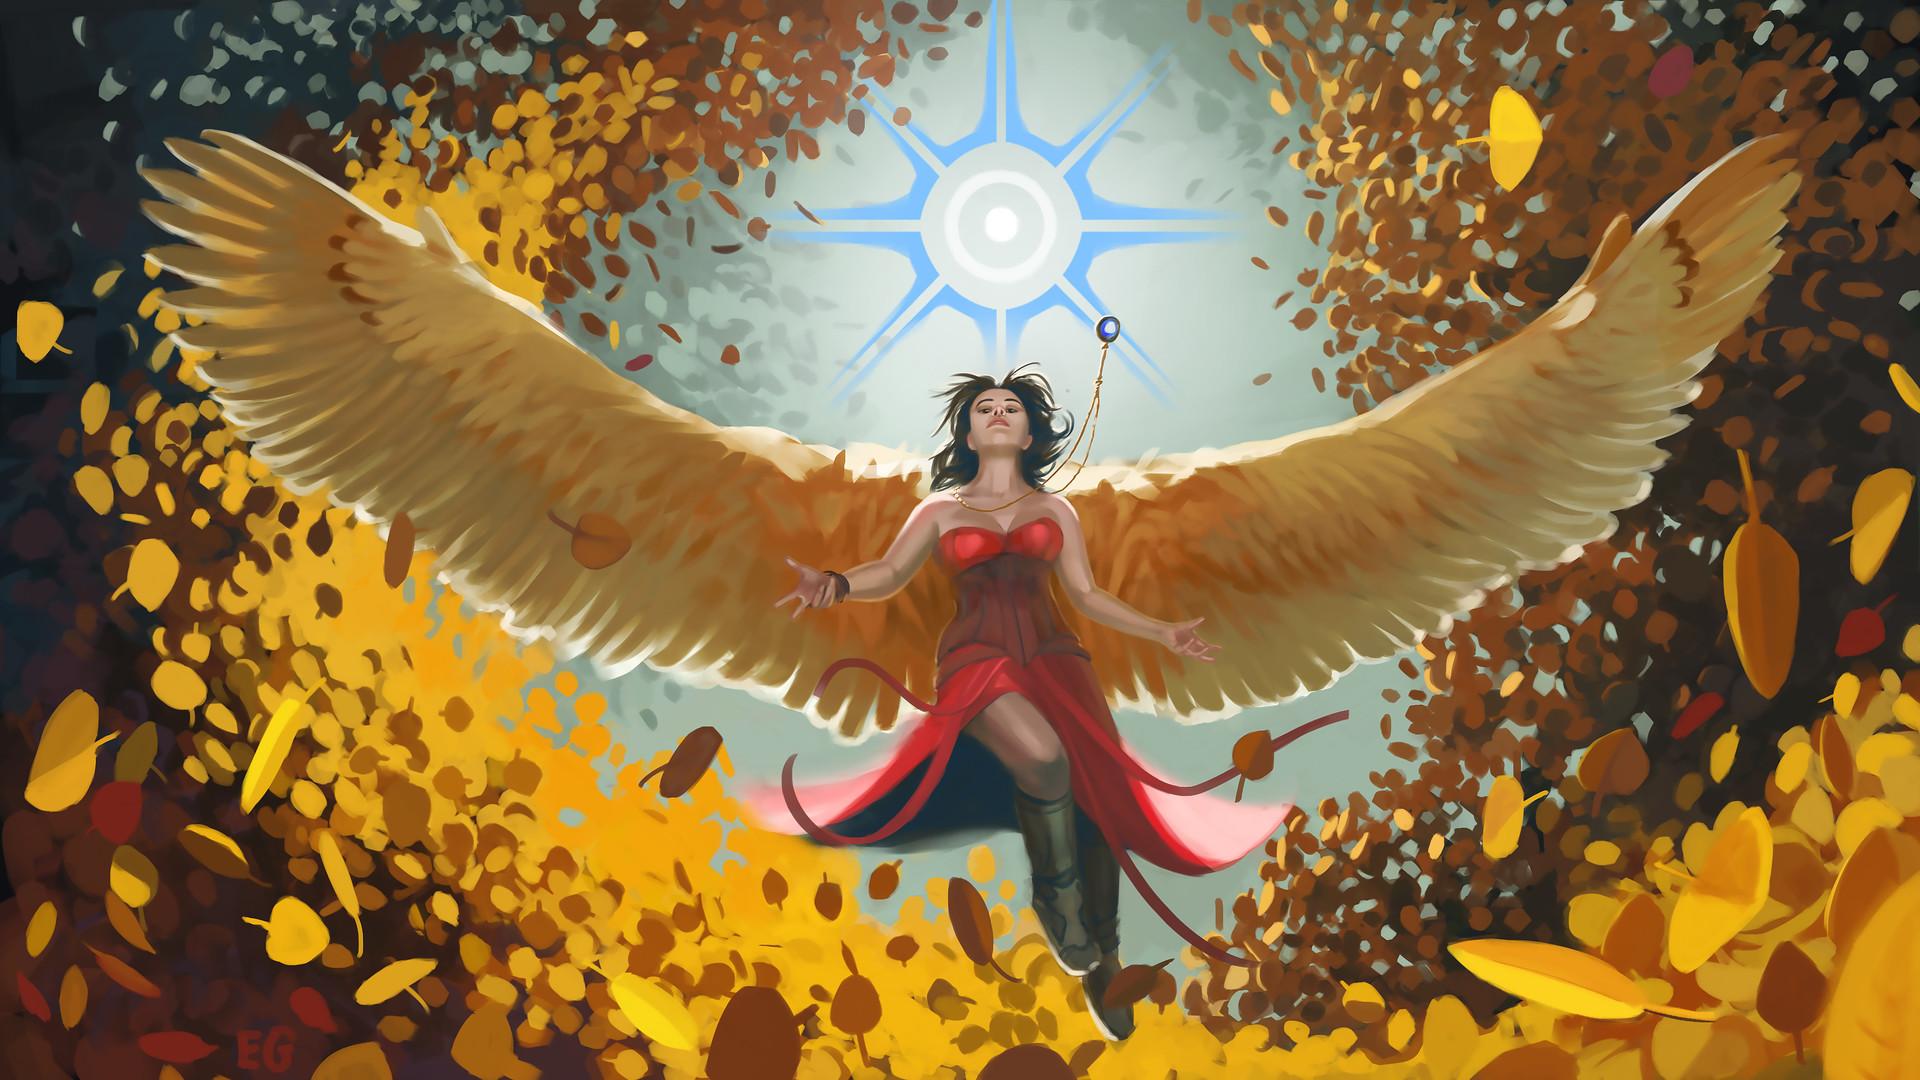 eric-geusz-angel-f.jpg